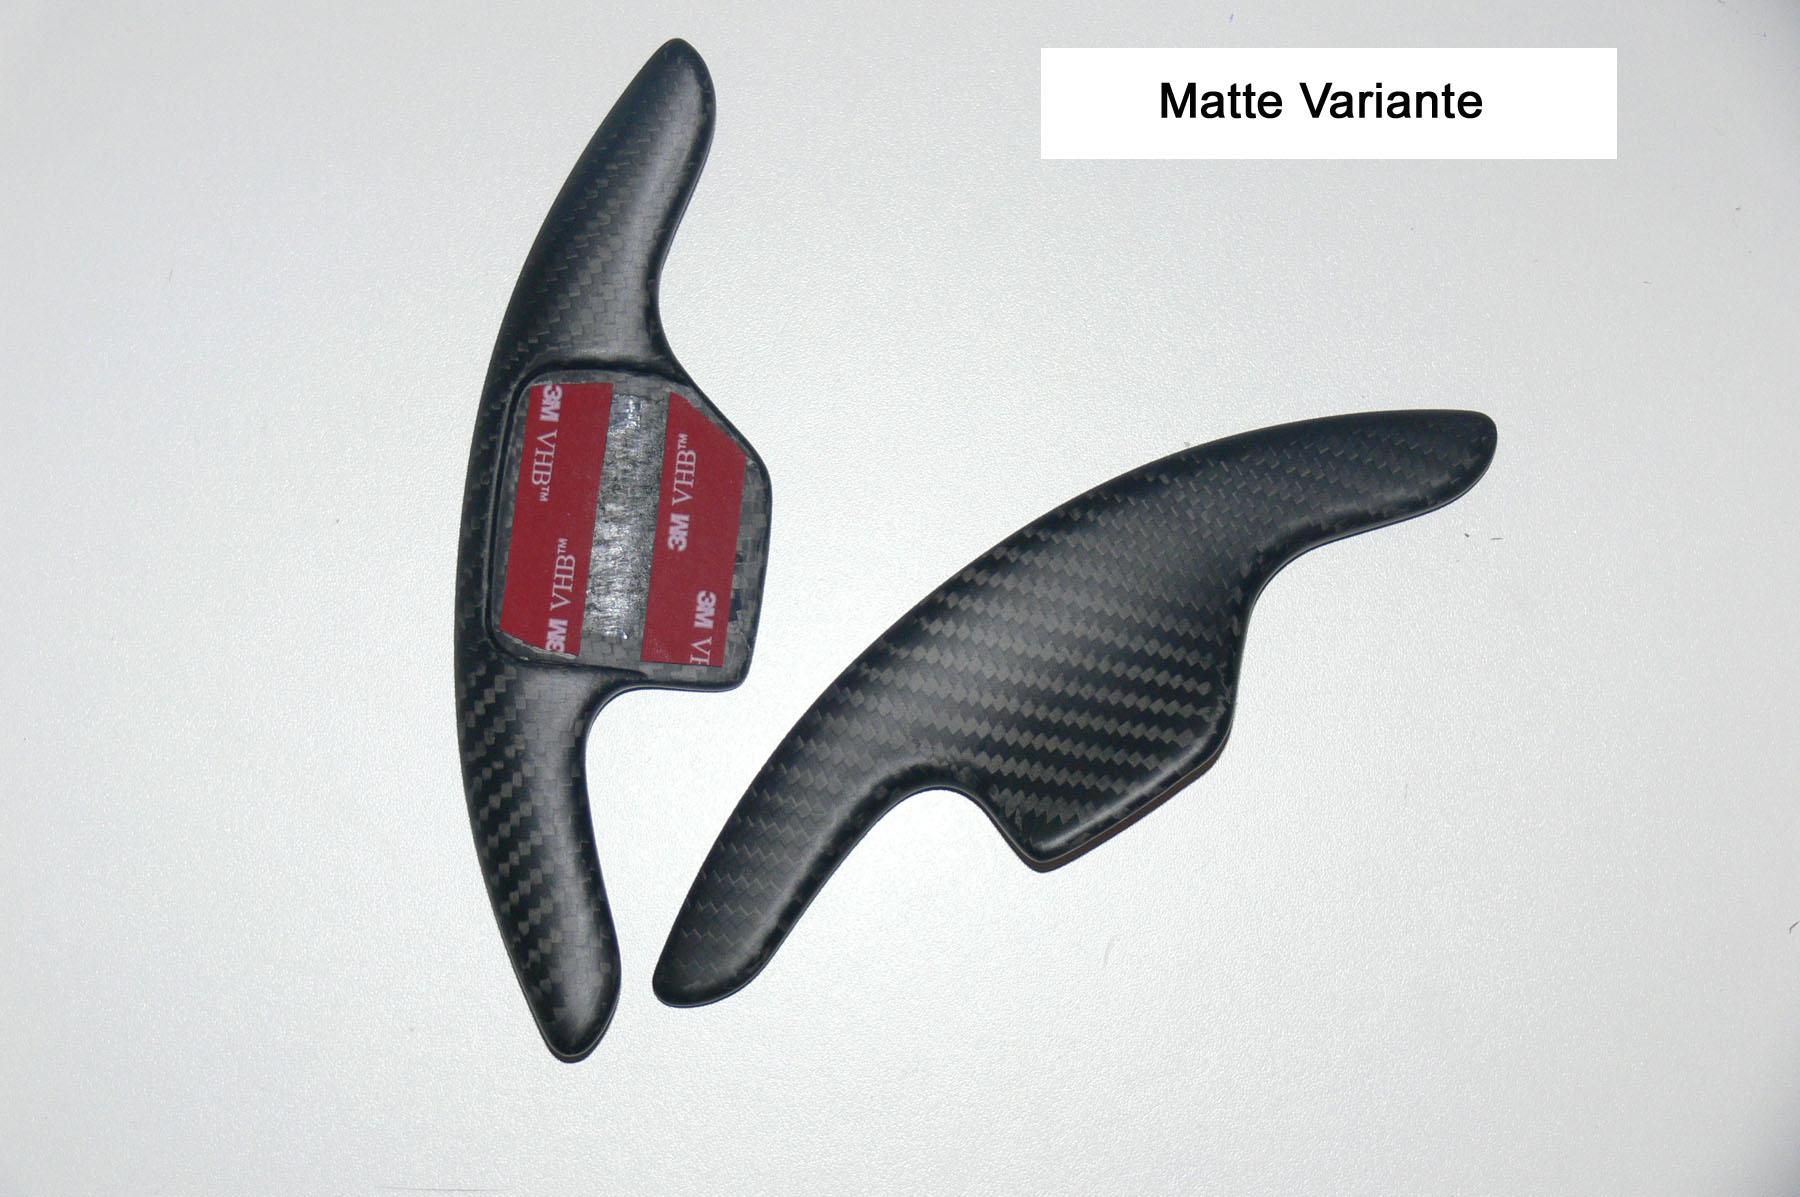 V1 Carbon Schaltwippen-Verlängerung passt für Audi Q5 8R Q7 R8 TT TTS TTRS 8J